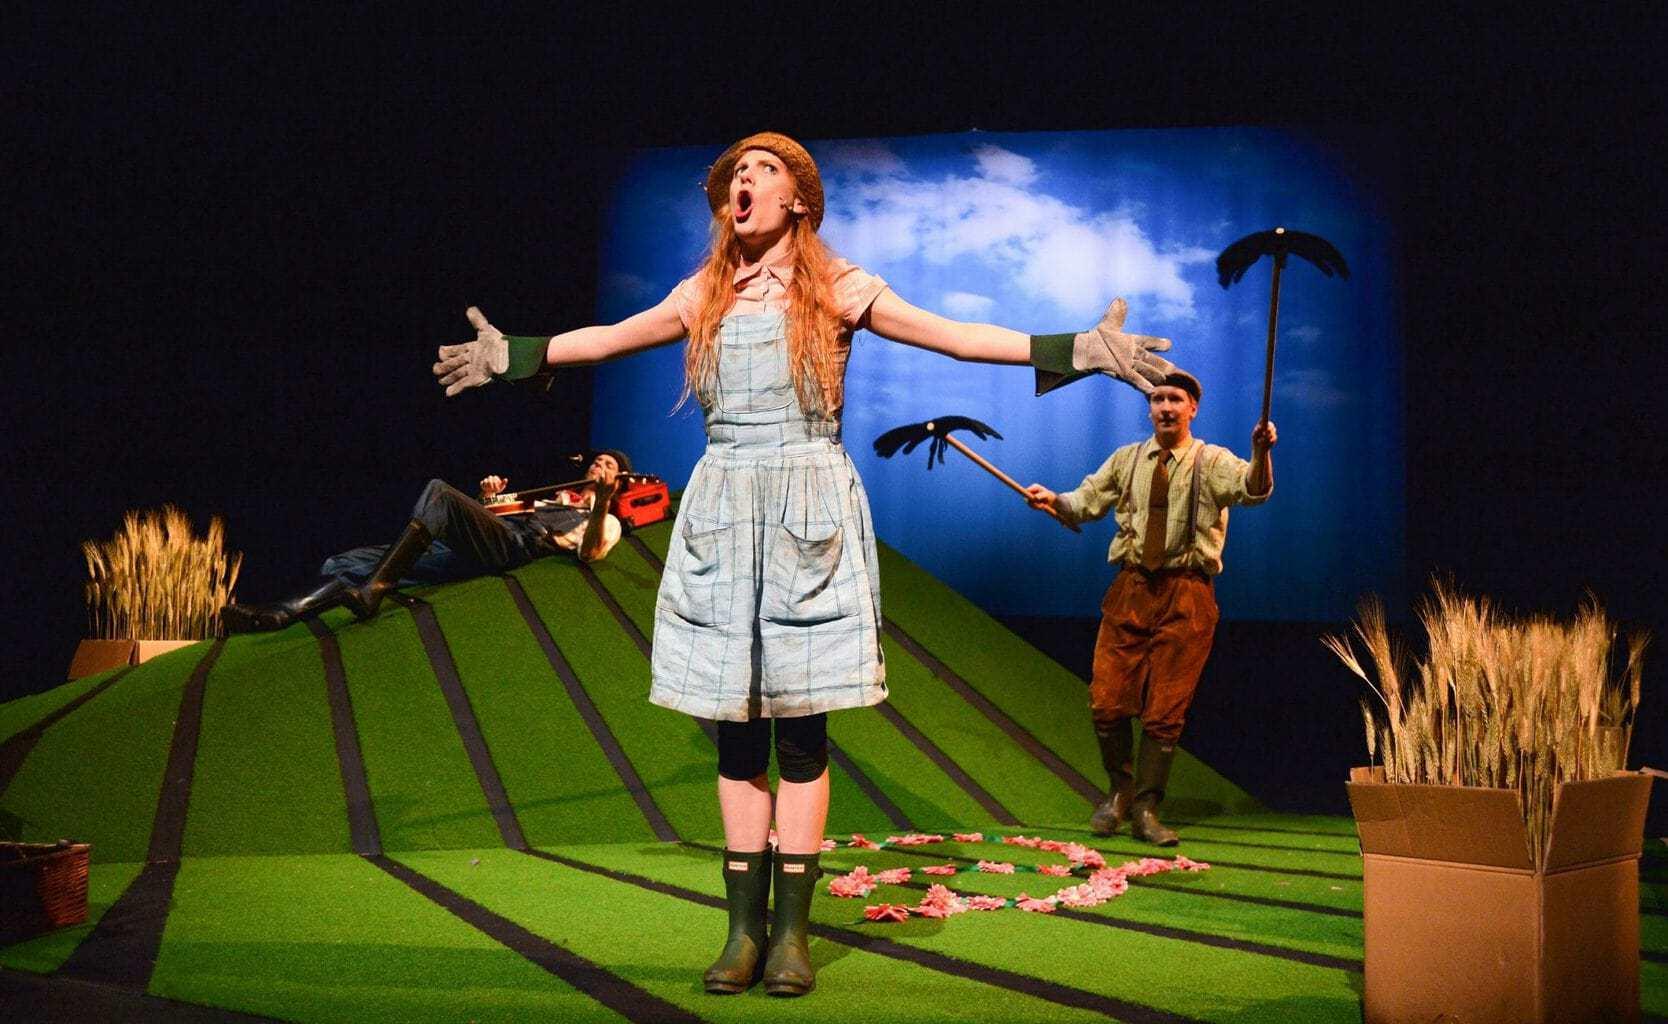 Muireann Bird (Betty O'Barley) in The Scarecrows' Wedding (Edinburgh Festival 2015). Photo Steve Ullathorne